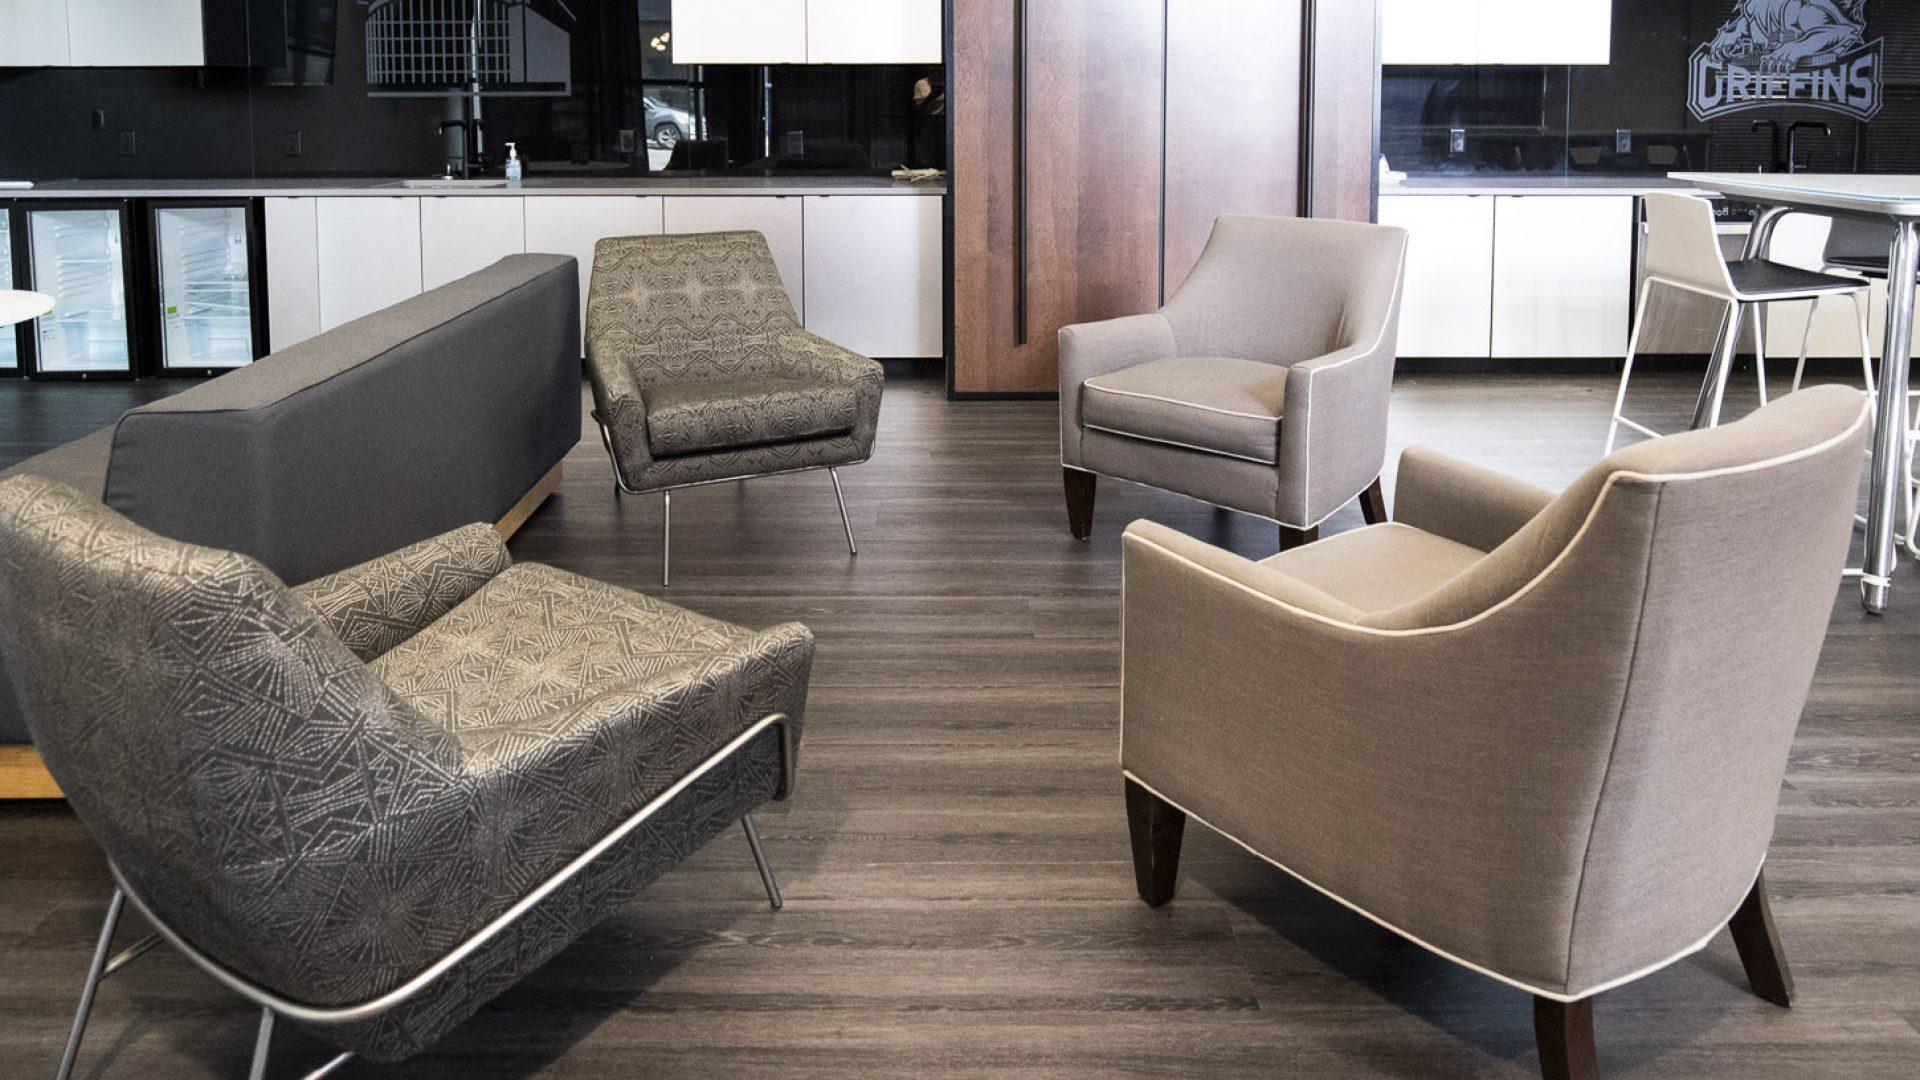 Grand Rapids Griffins VIP Lounge